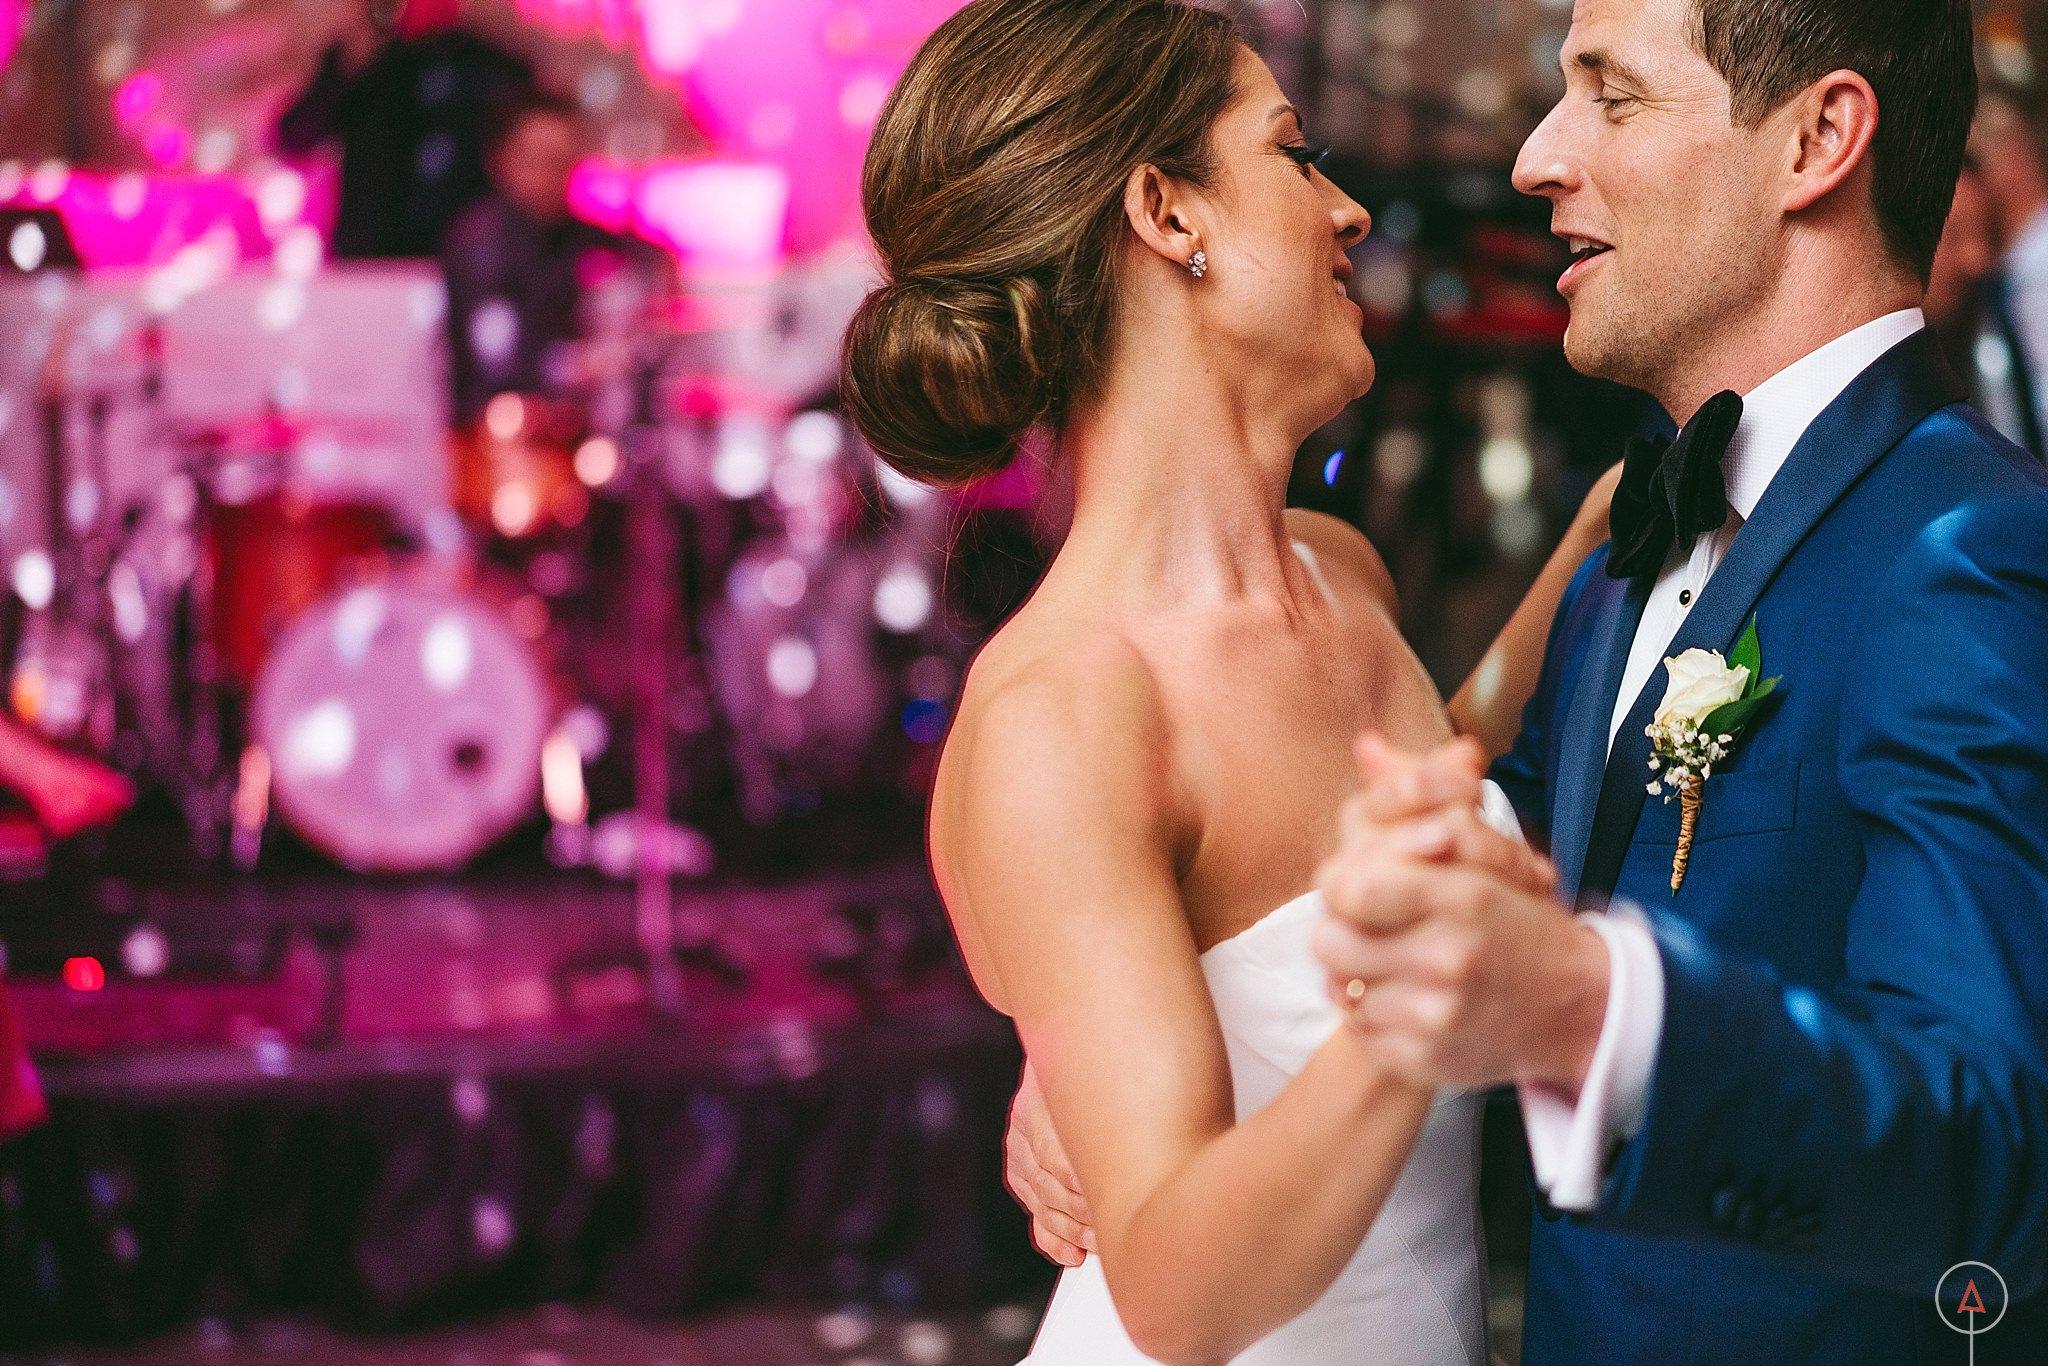 cardiff-wedding-photographer-aga-tomaszek_0311